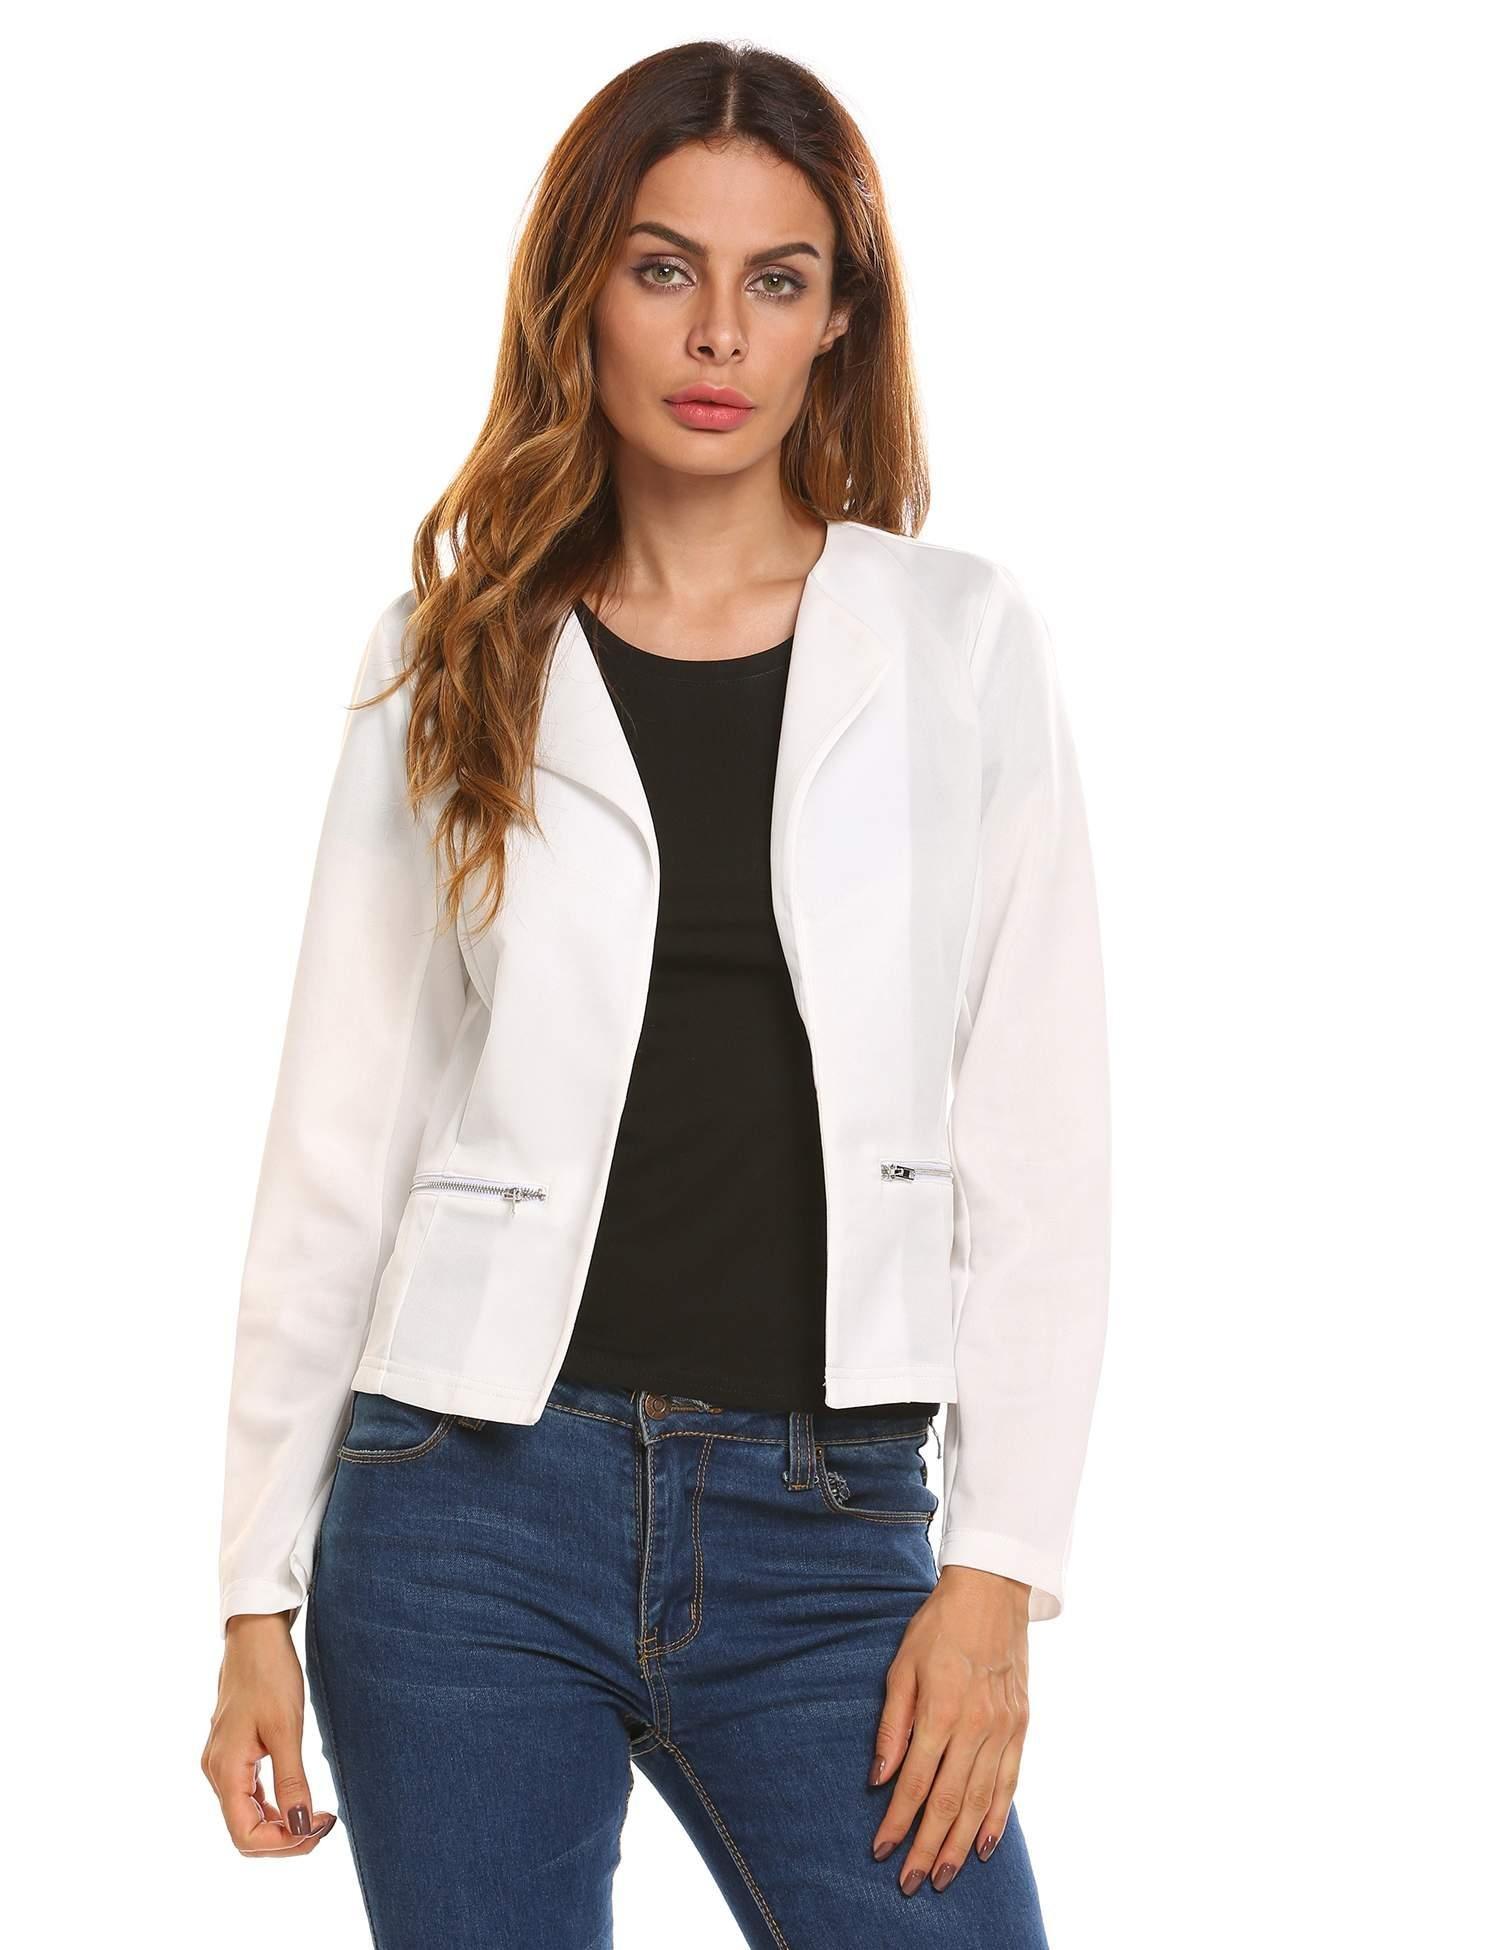 Angvns Women's Cardigan Blazer, Lightweight Long Sleeve Zipper Front Open Casual Office Blazer Jacket